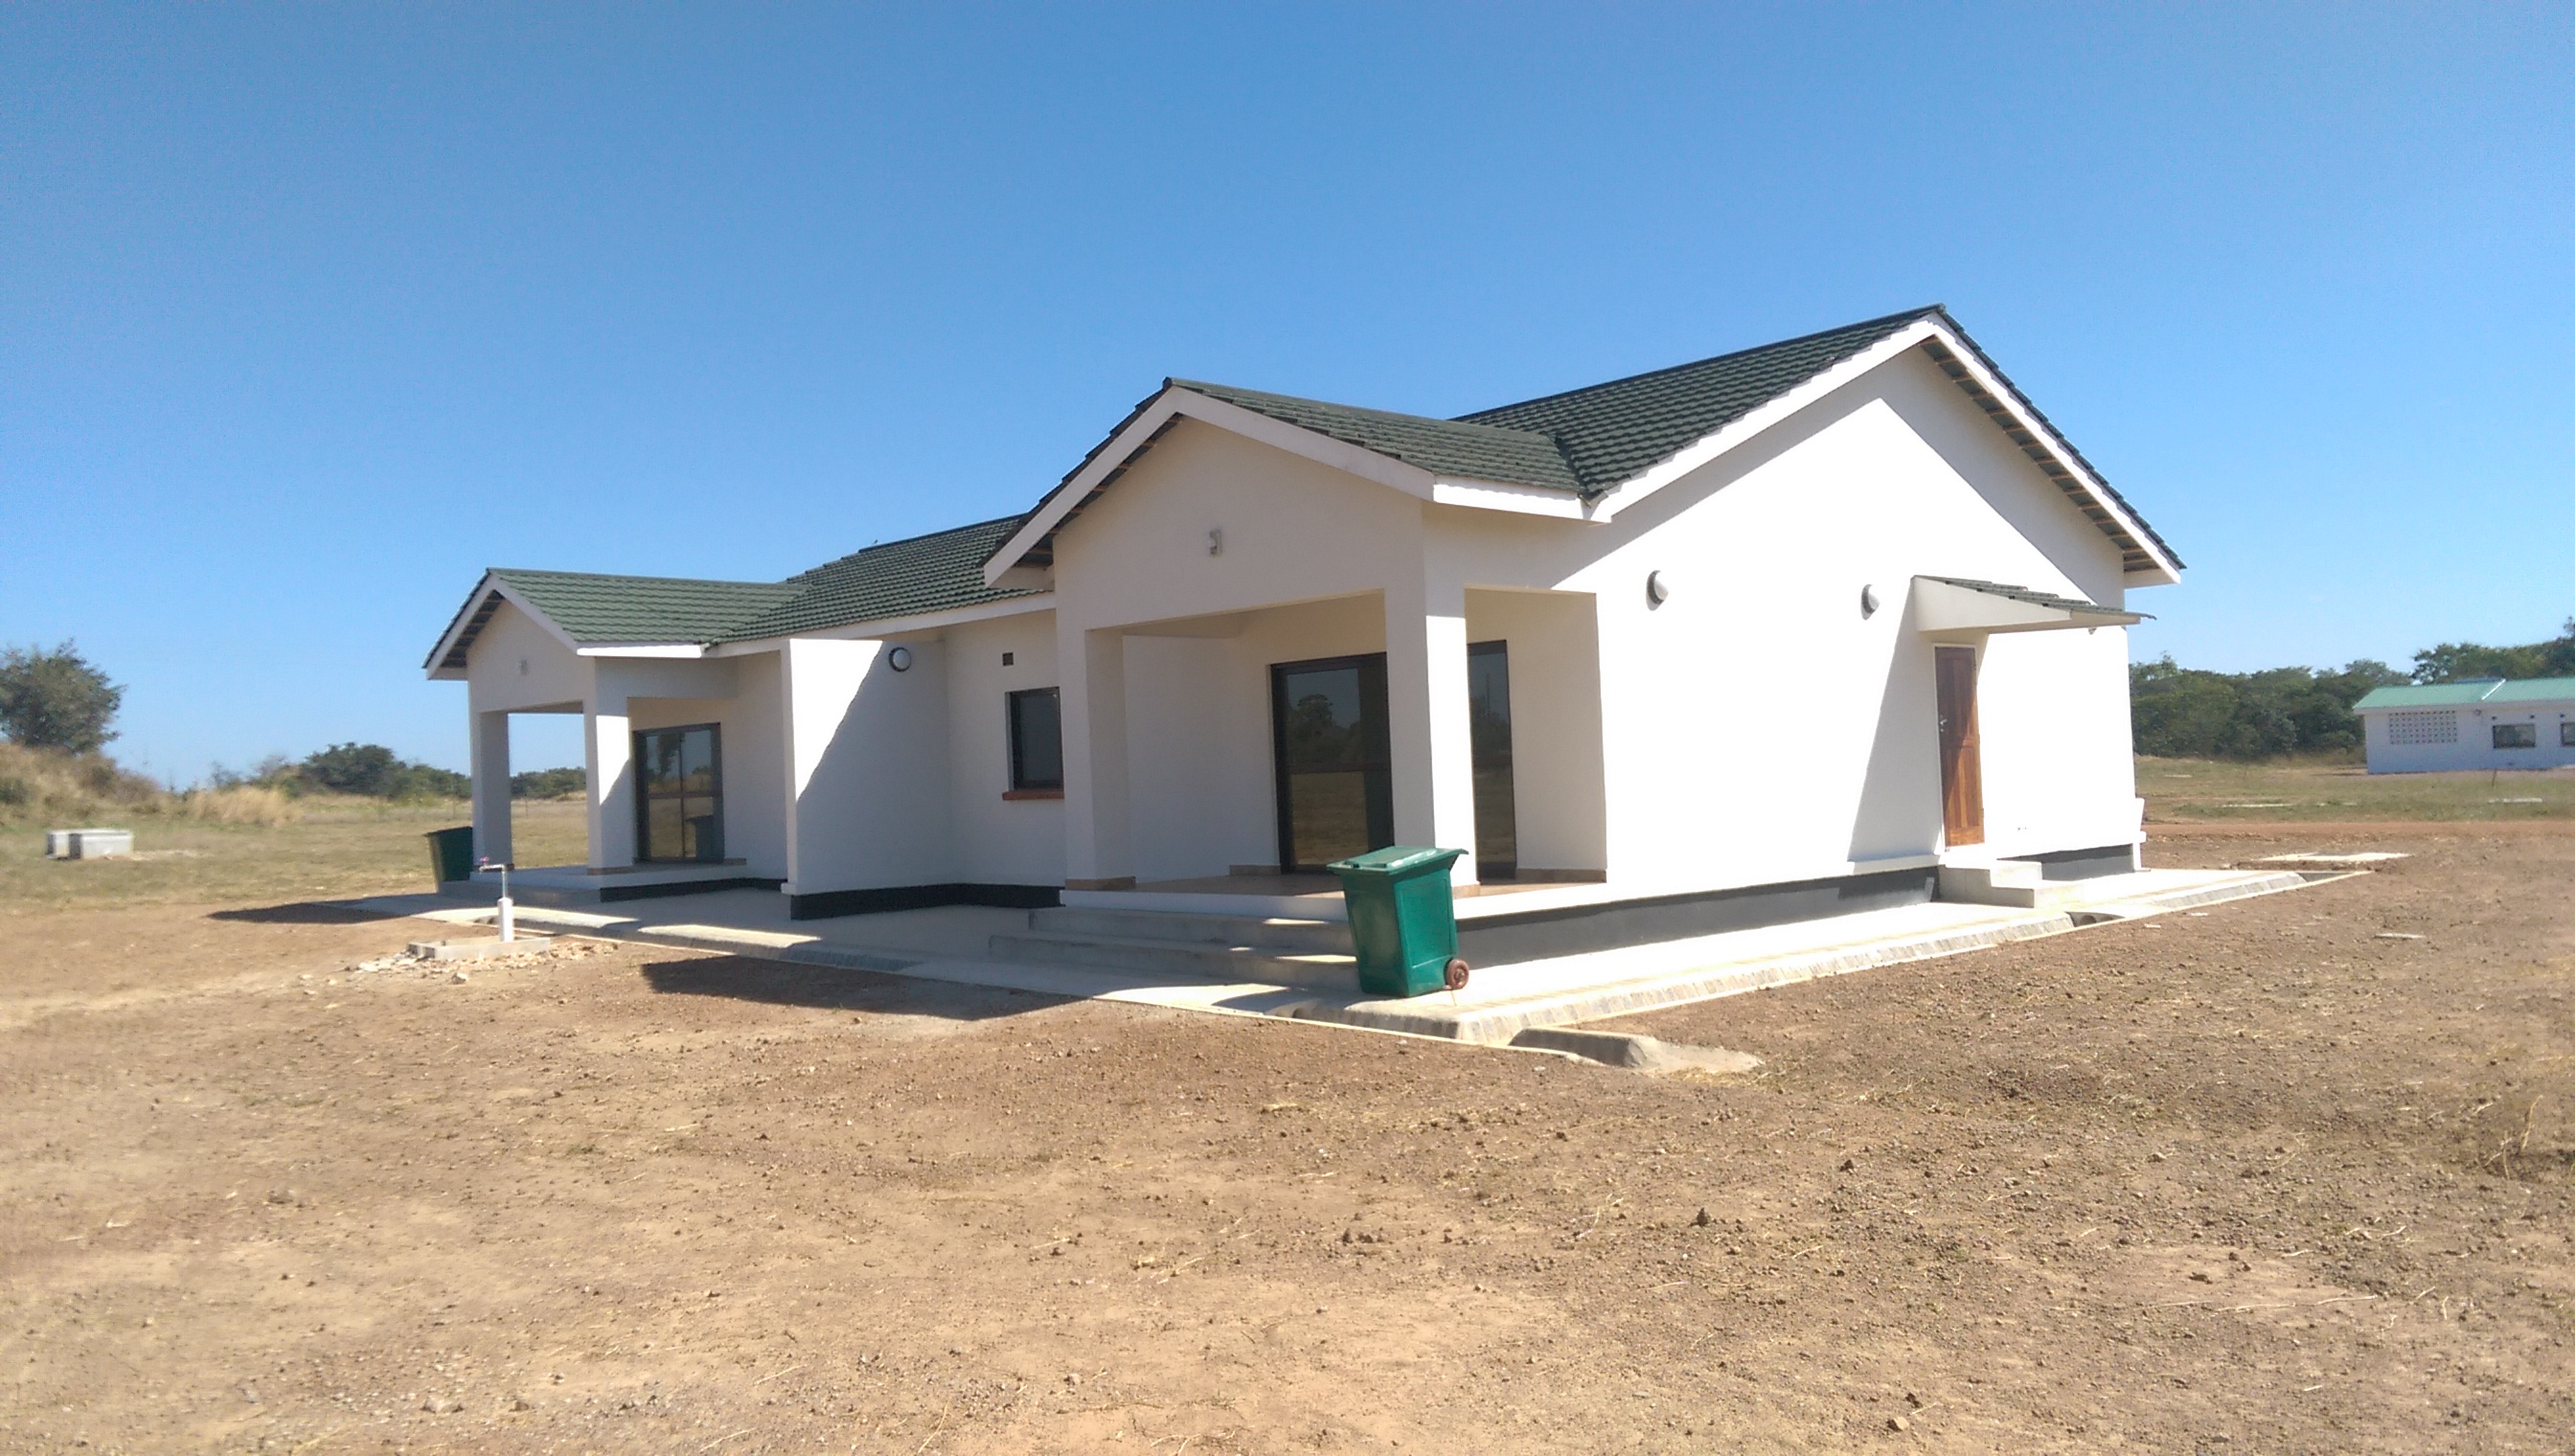 2 Bed House – JTI ADET – Chisamba – May 2016